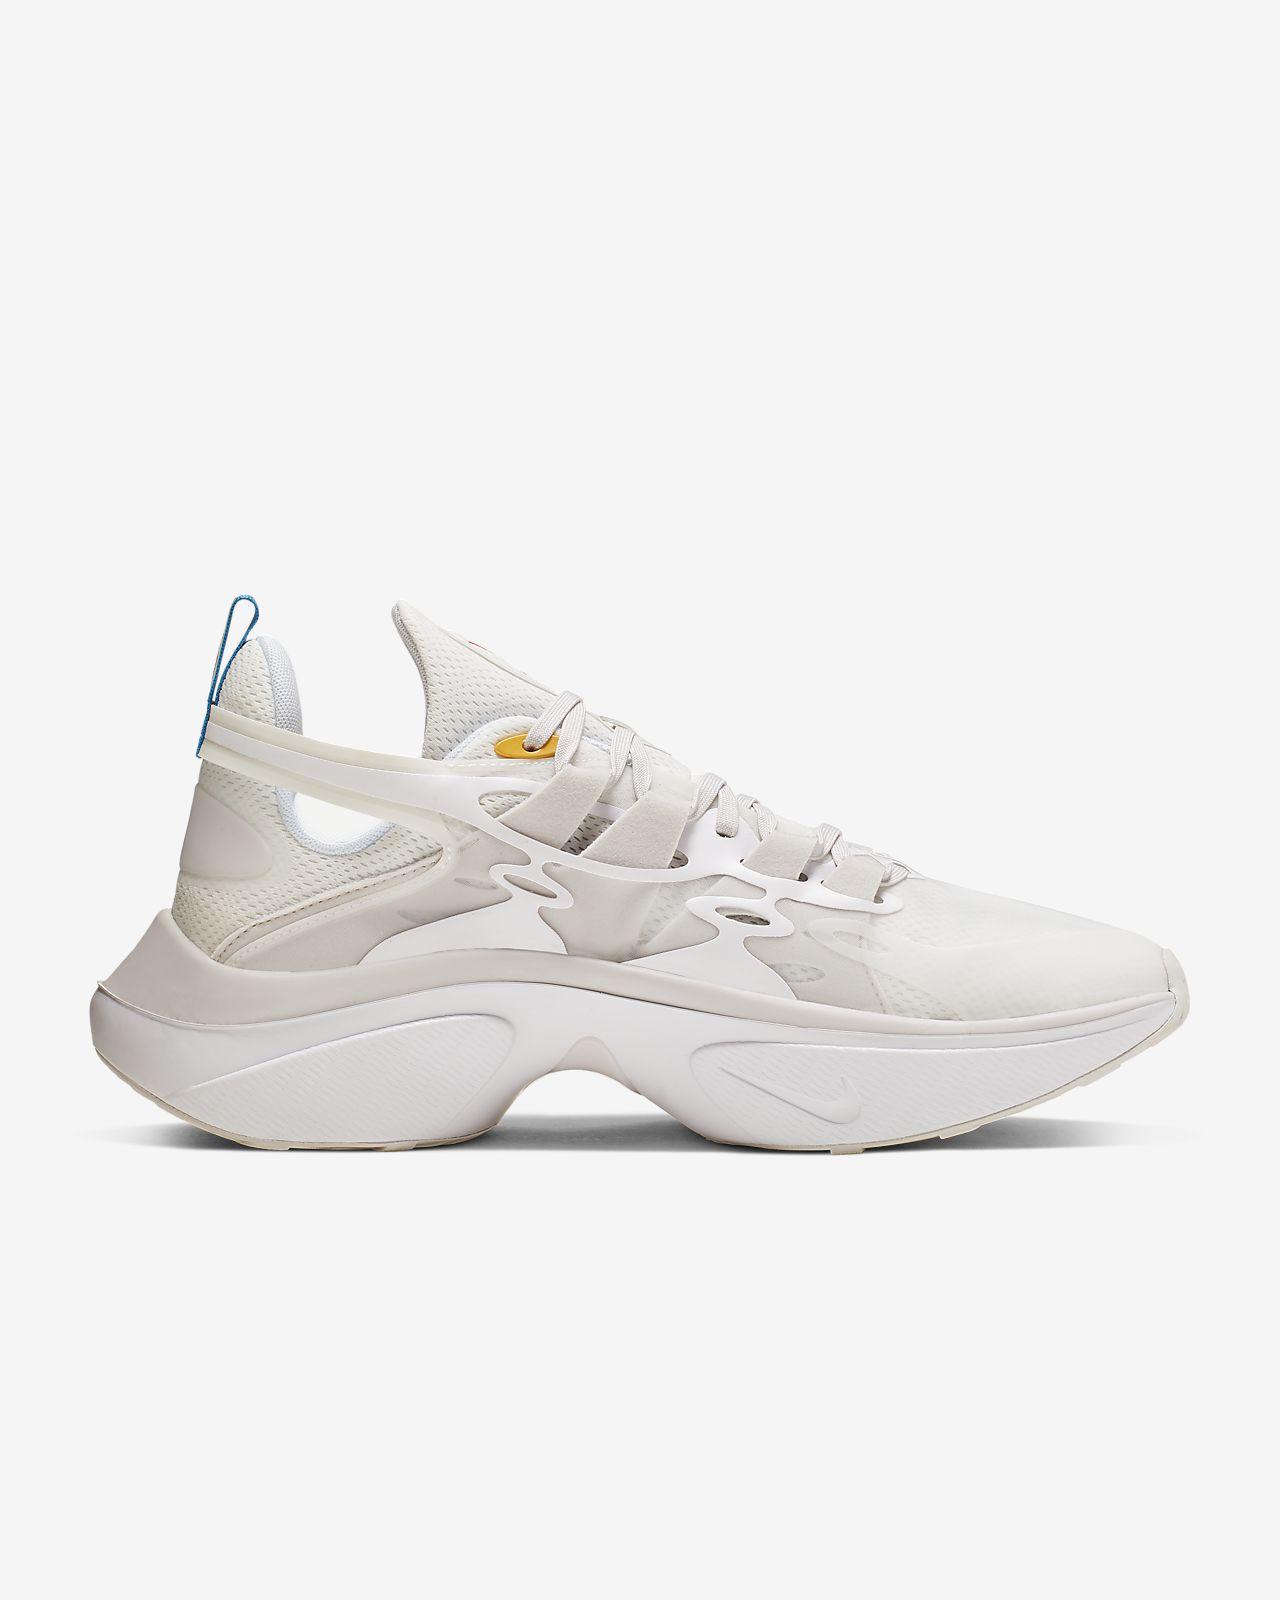 Women's Trainers Nike Zoom 2K Women's white 50% off